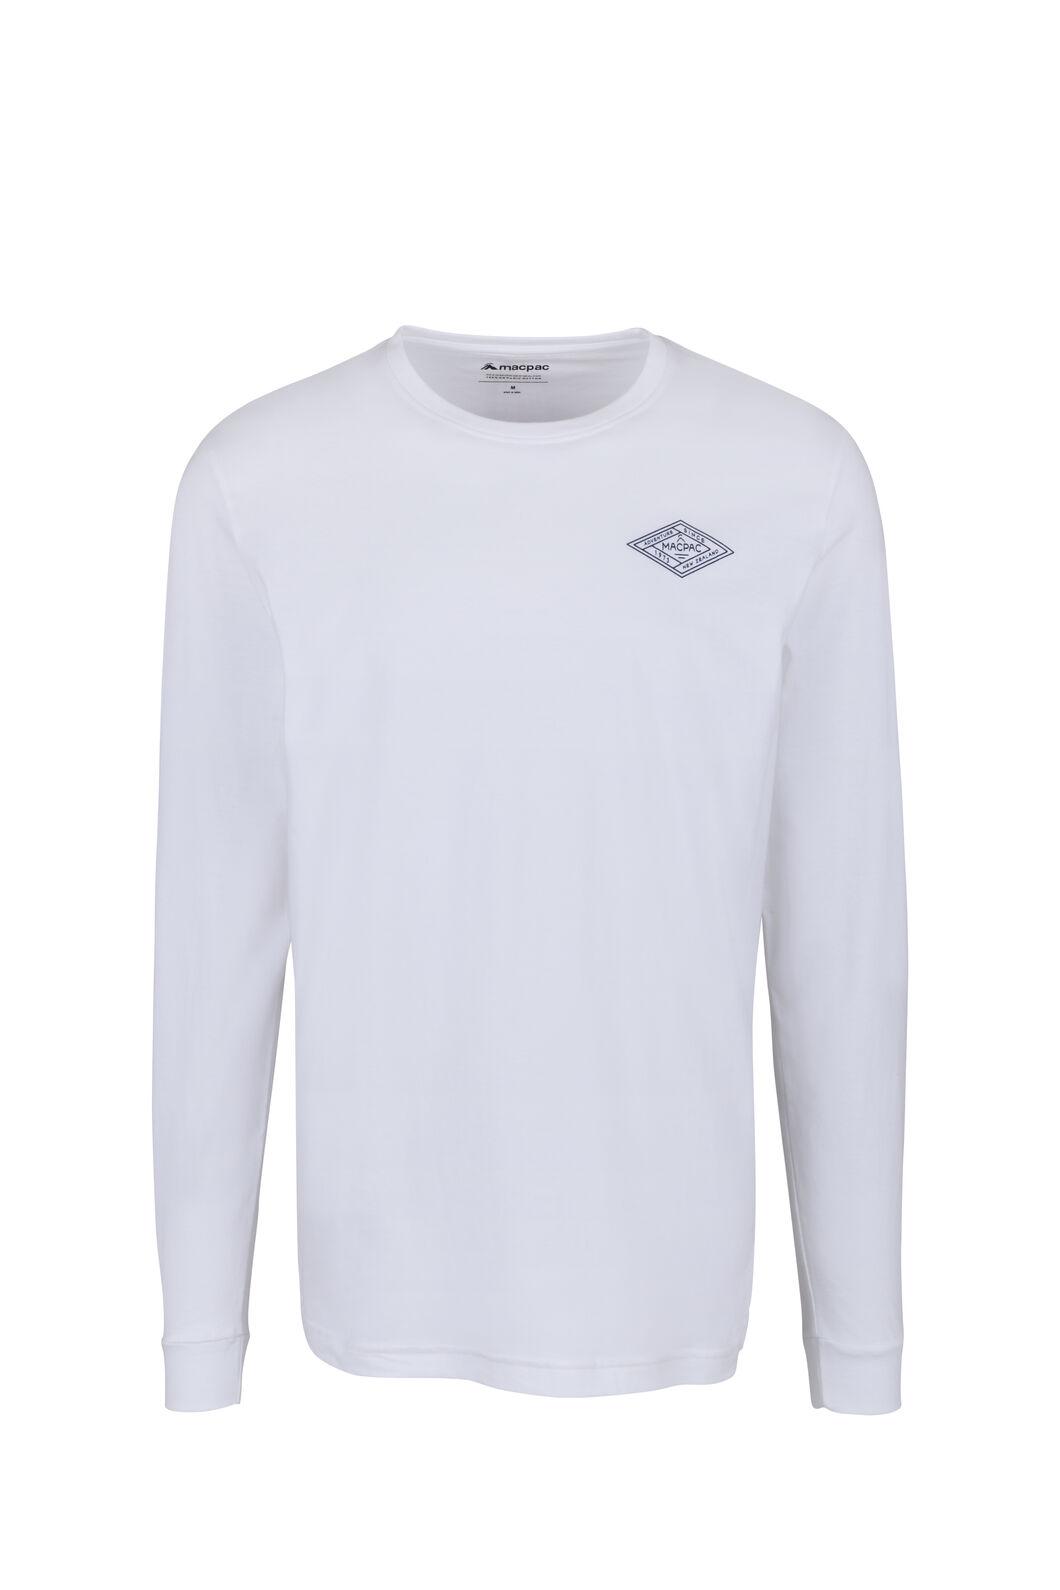 Macpac Diamond Fairtrade Organic Cotton Long Sleeve Tee — Men's, White, hi-res